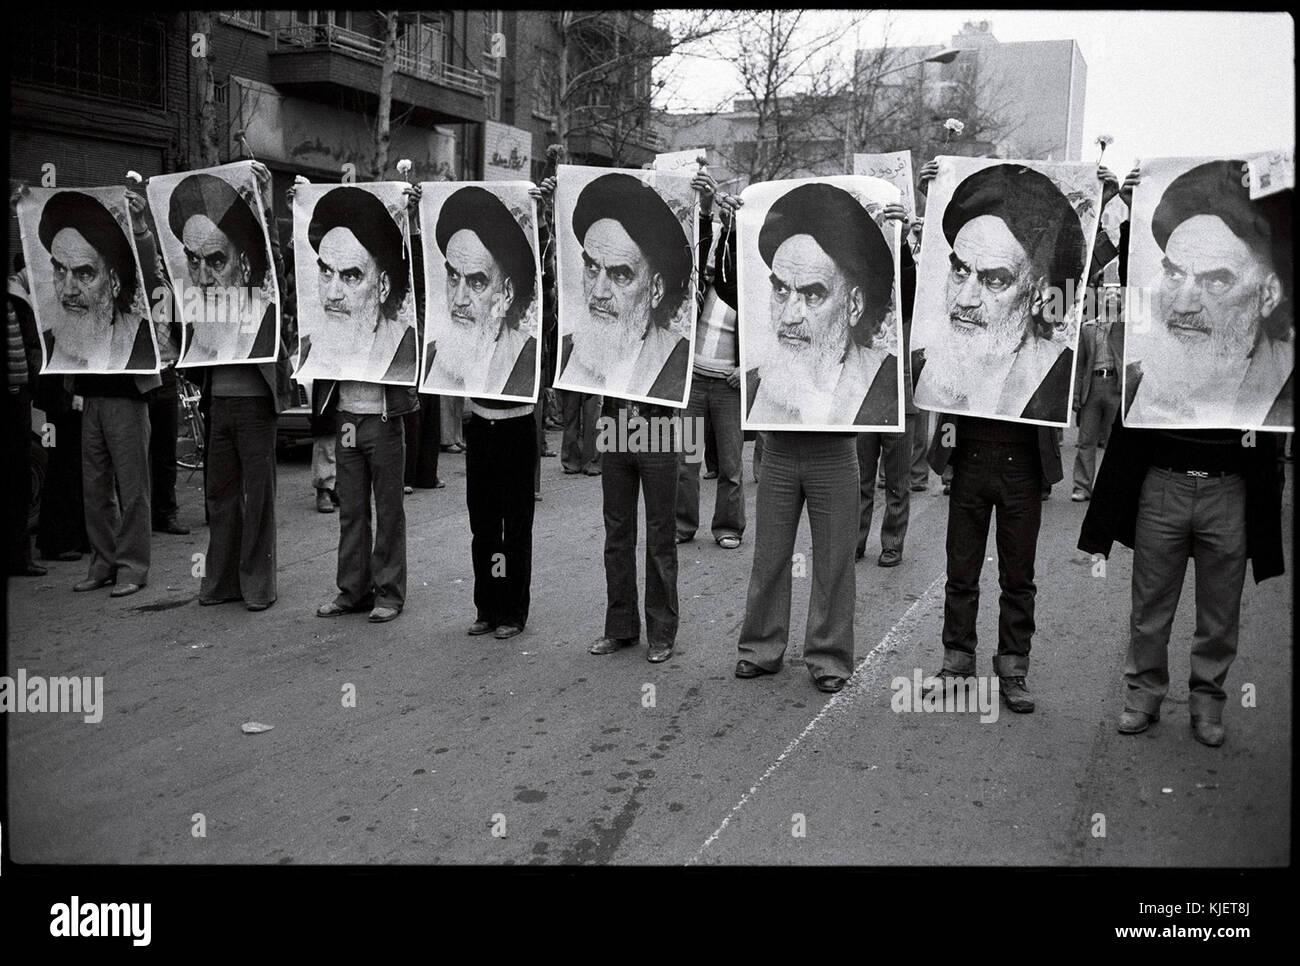 1978 Iranian revolution   row of men holding khomeini's photos - Stock Image